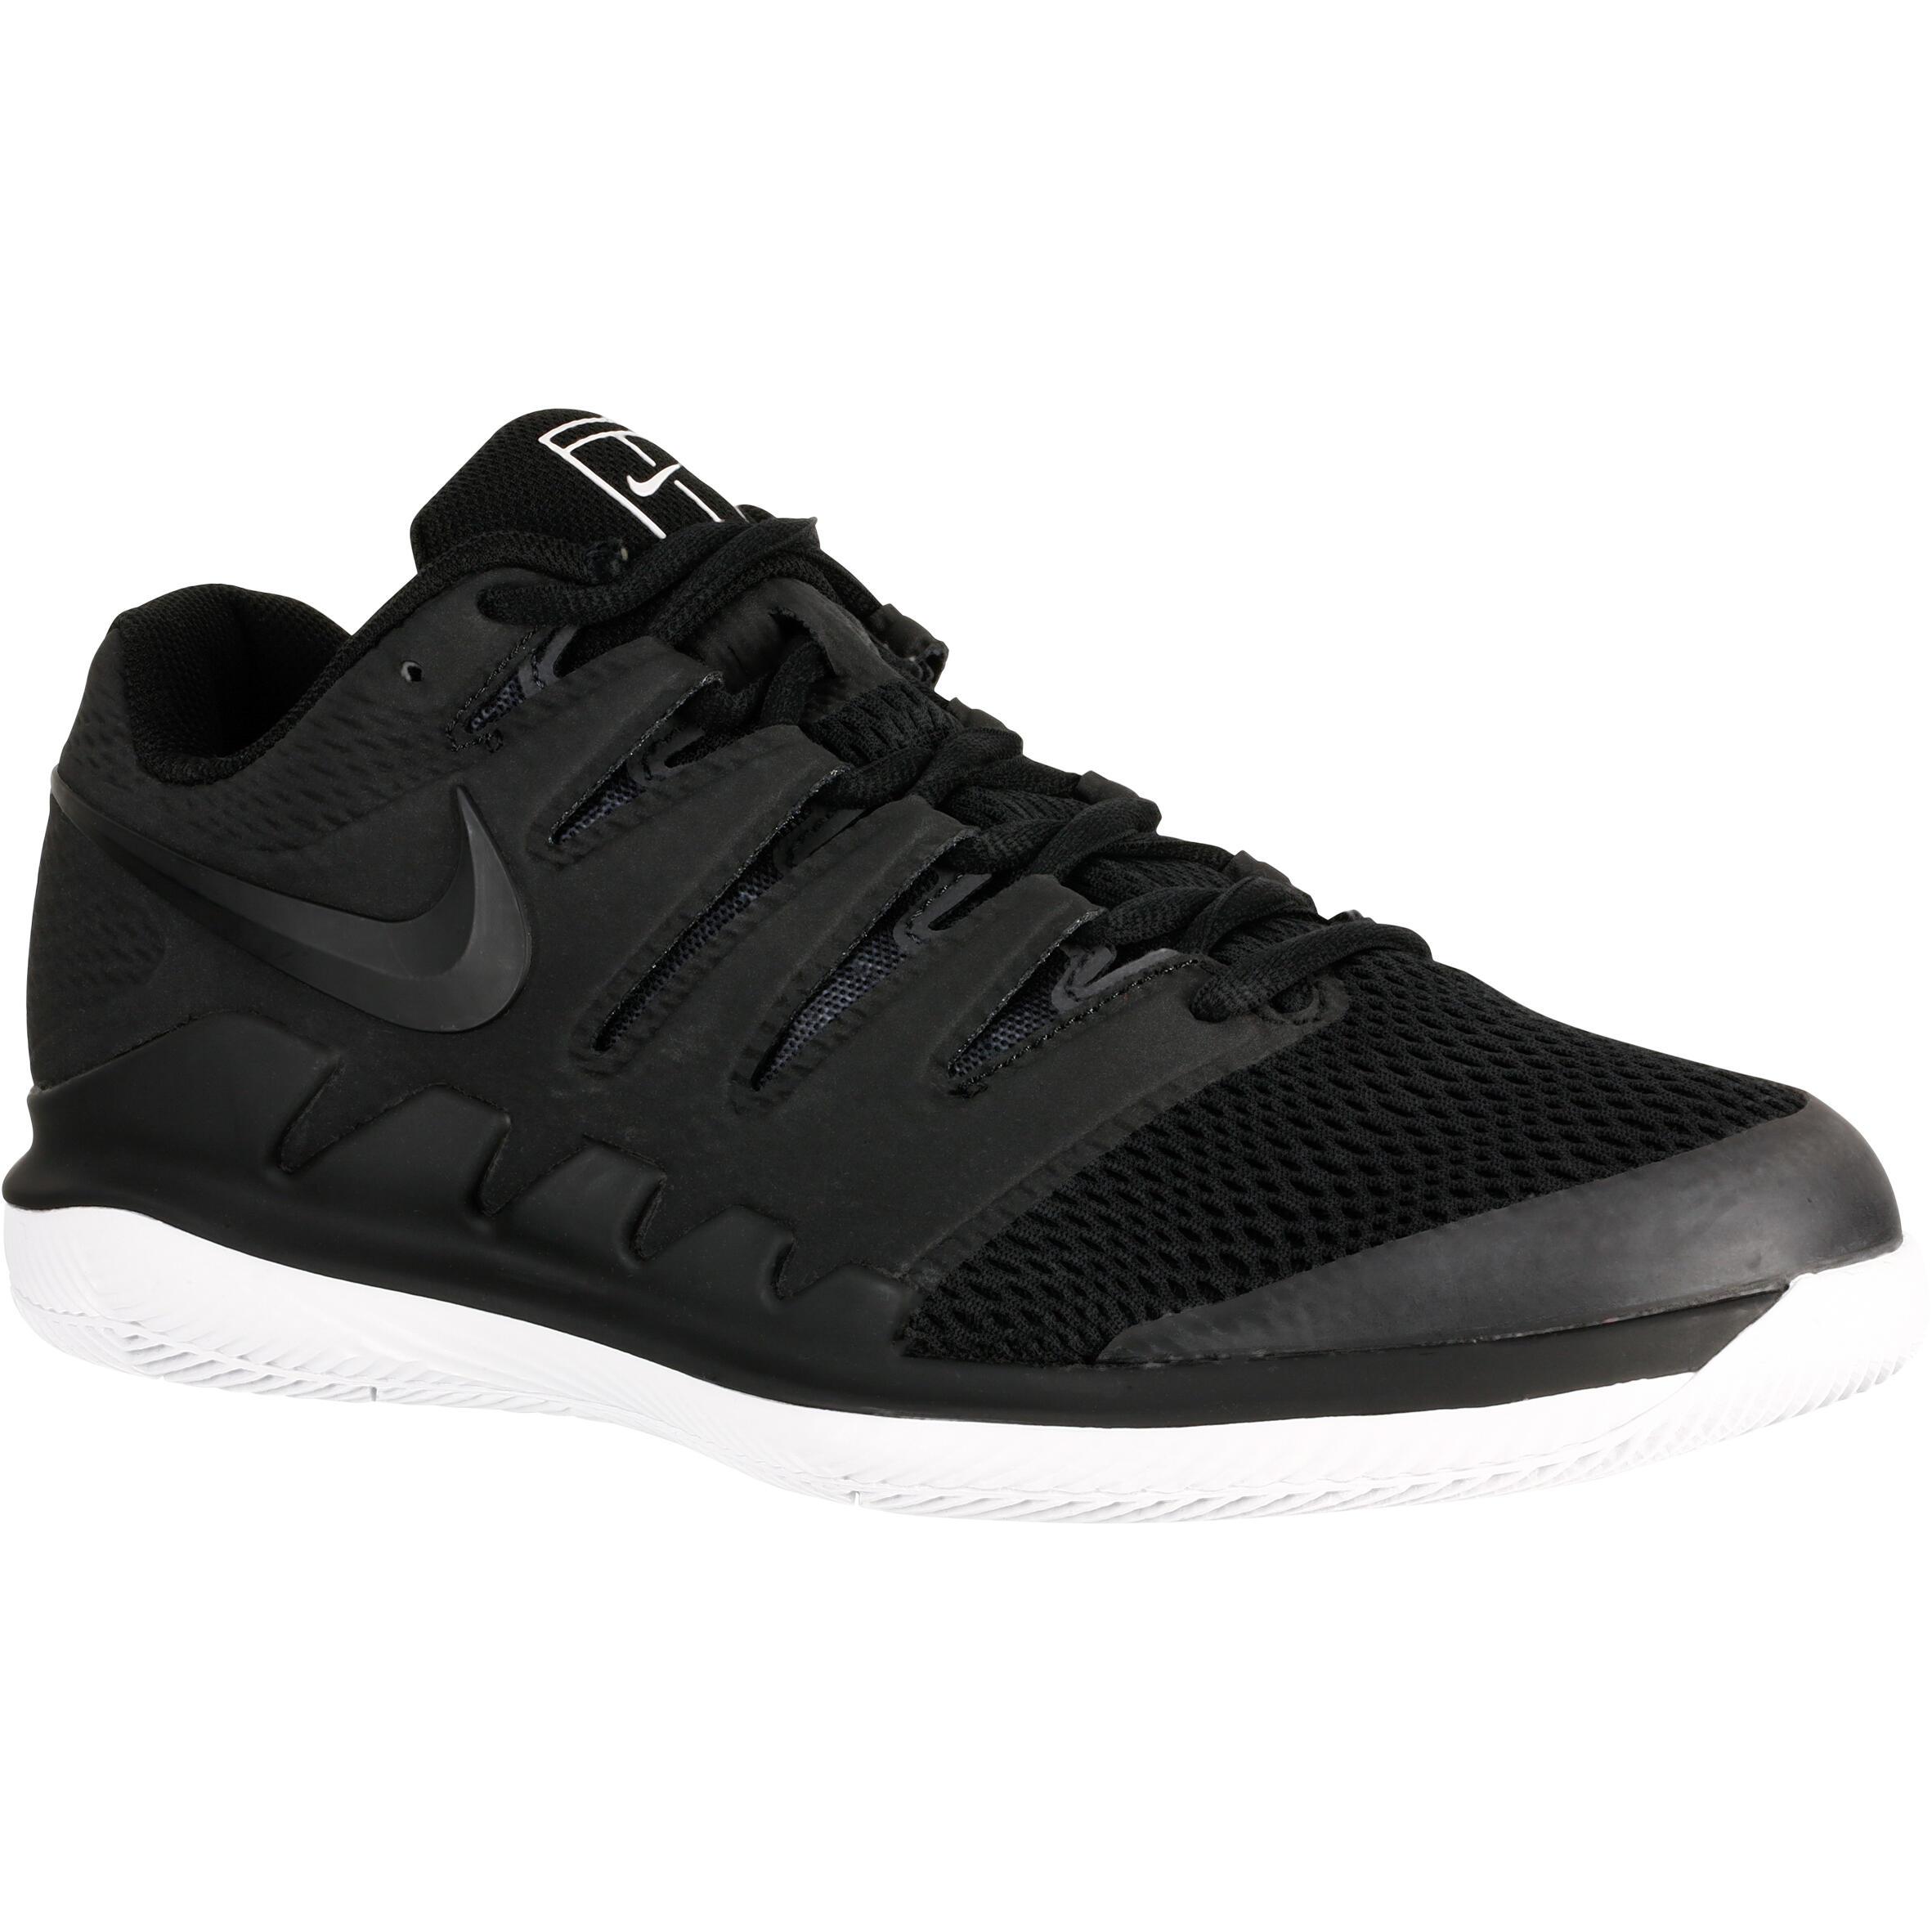 766e267e Comprar Zapatillas y calzado de tenis hombre | Decathlon